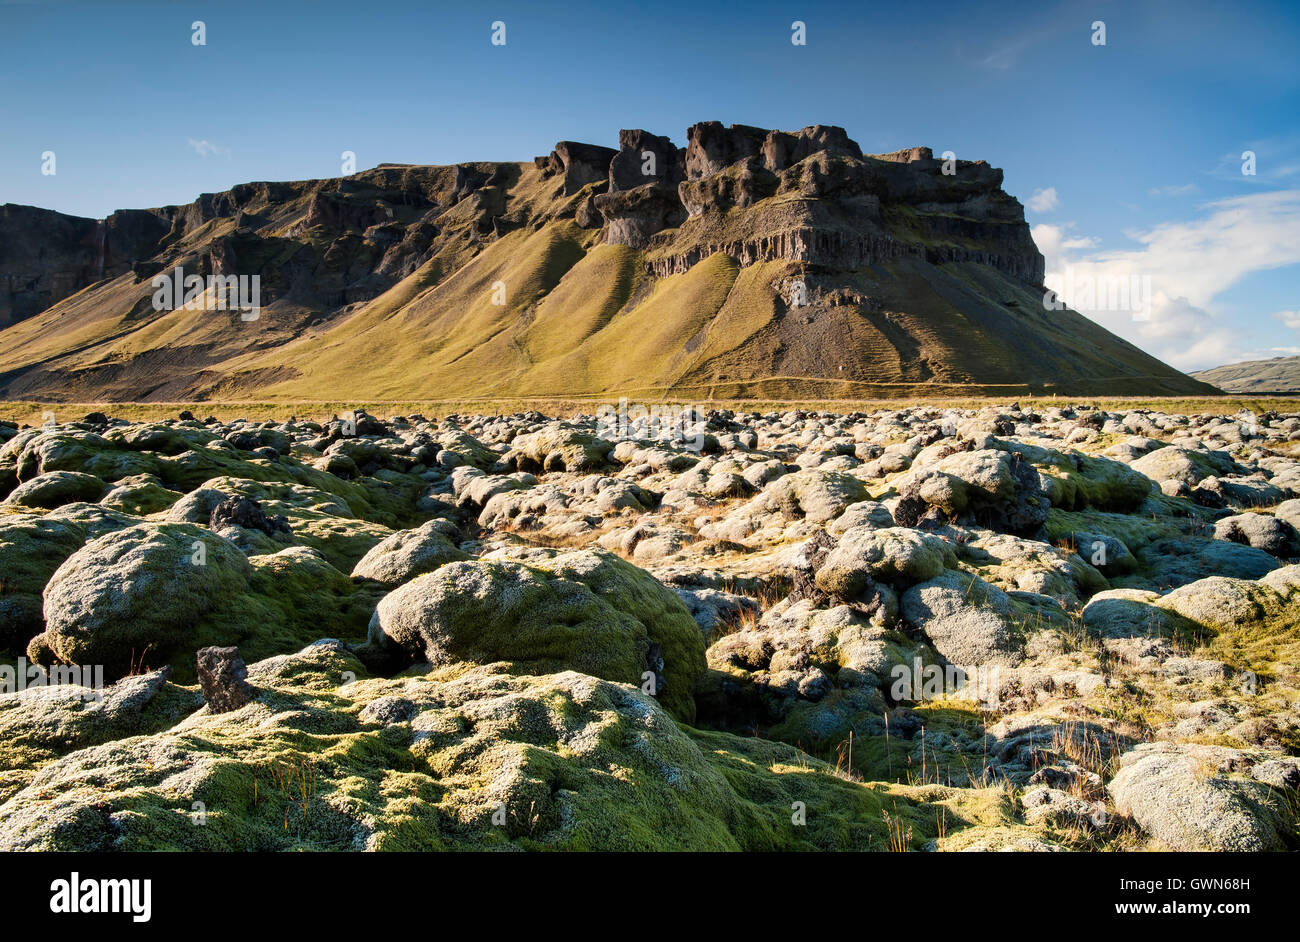 Dramatic Icelandic Scenery & Moss Covered Lava Field, near Kirkjubaejarklaustur, Southern Iceland - Stock Image